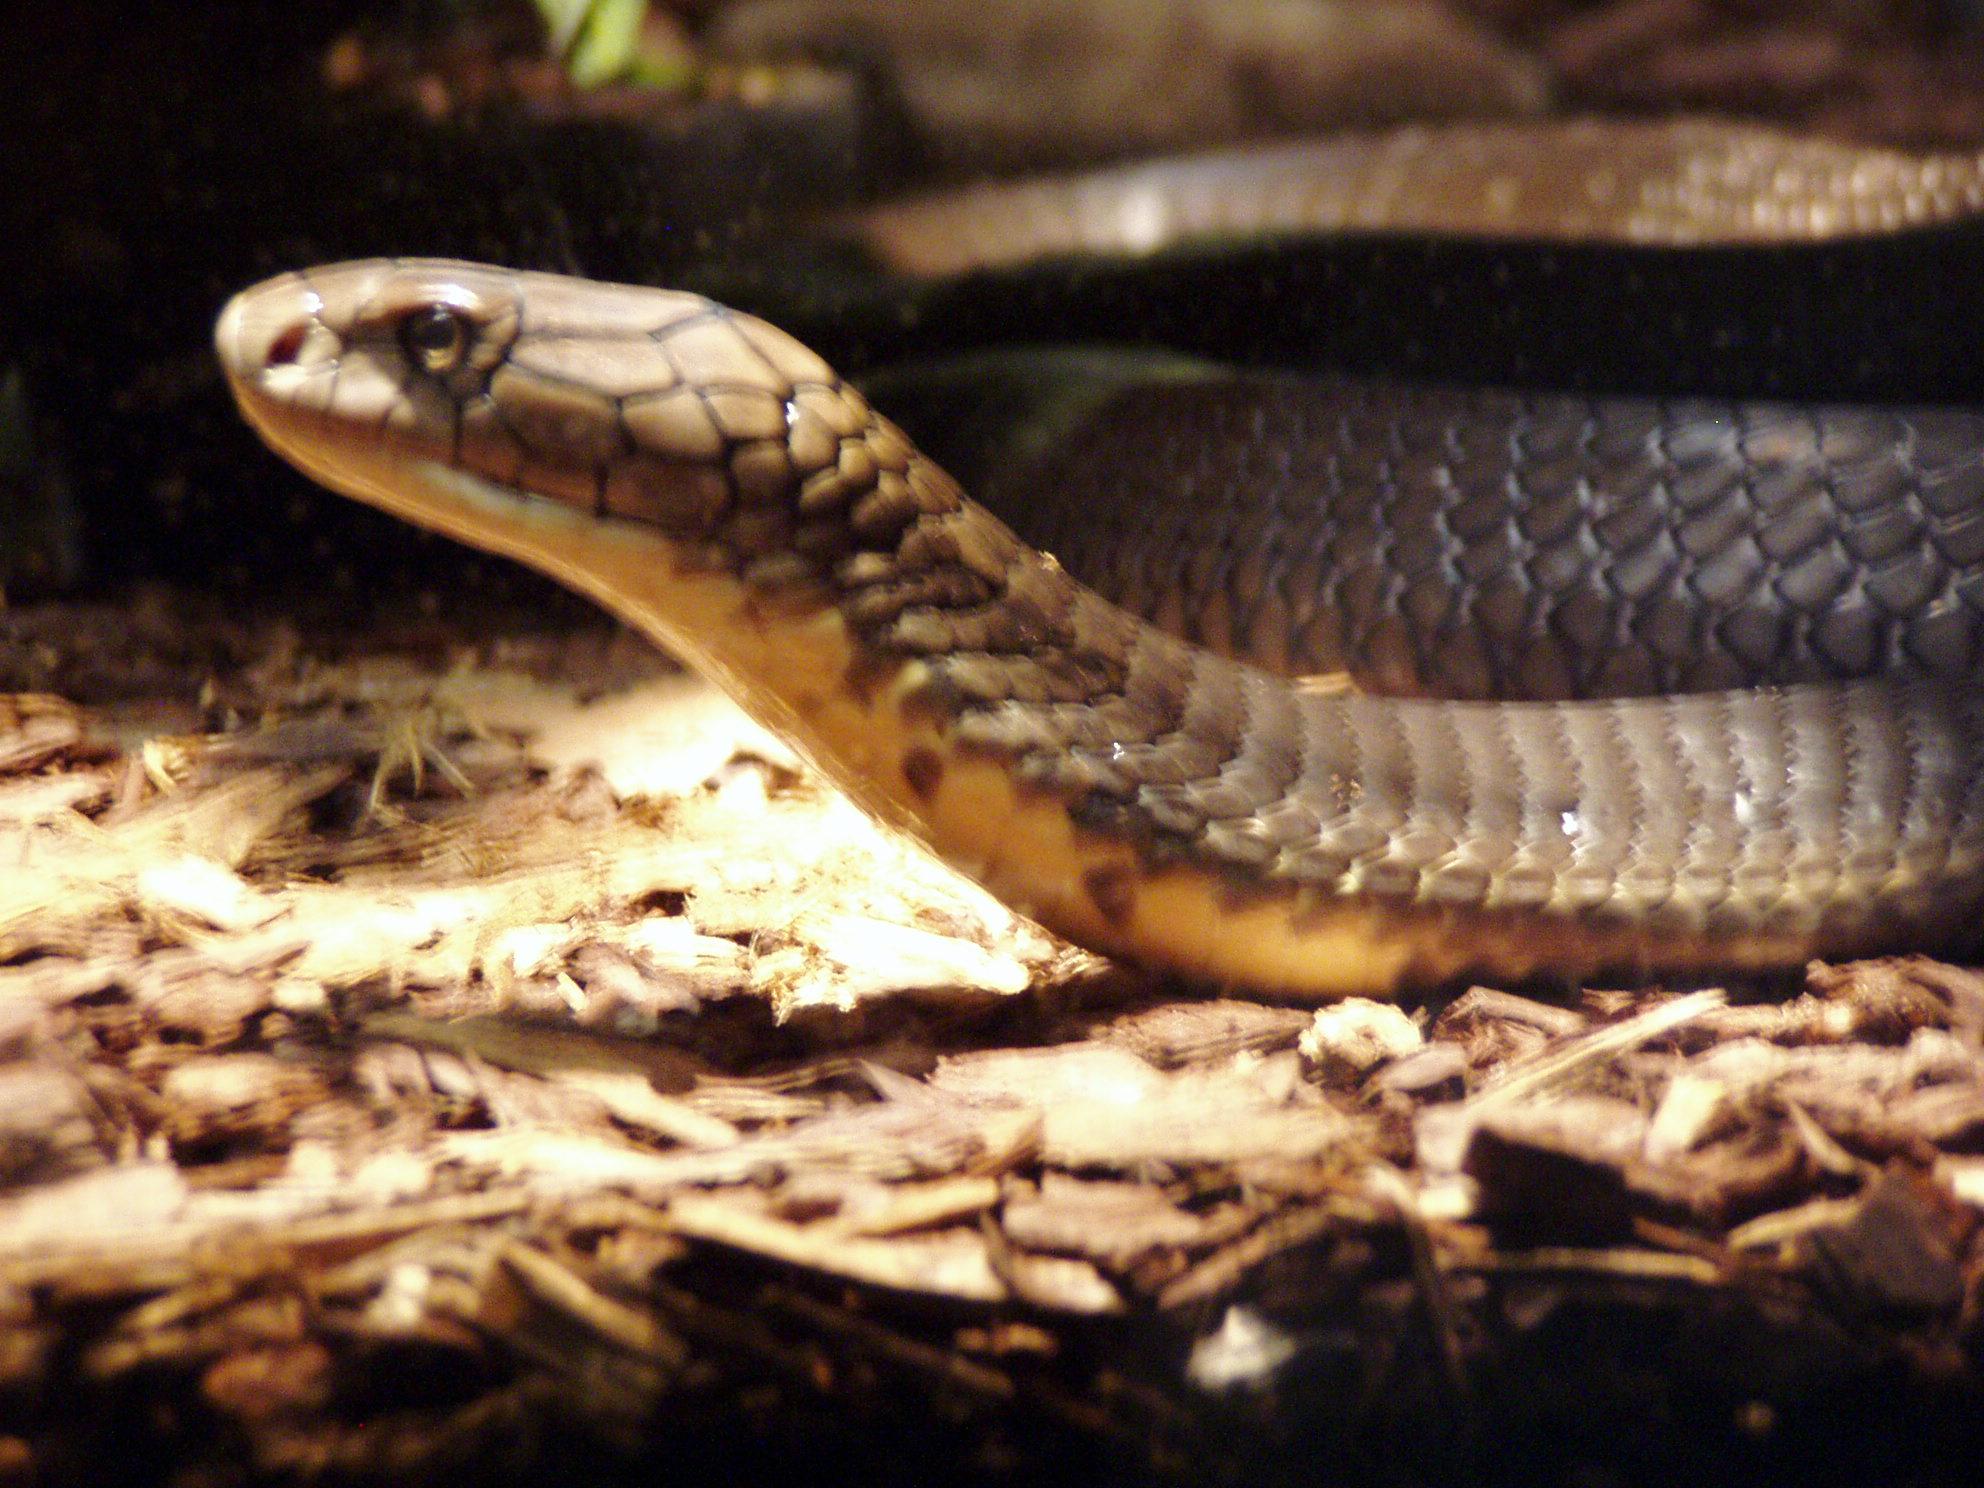 File:Ophiophagus hannah-Buffalo Zoo.JPG - Wikimedia Commons